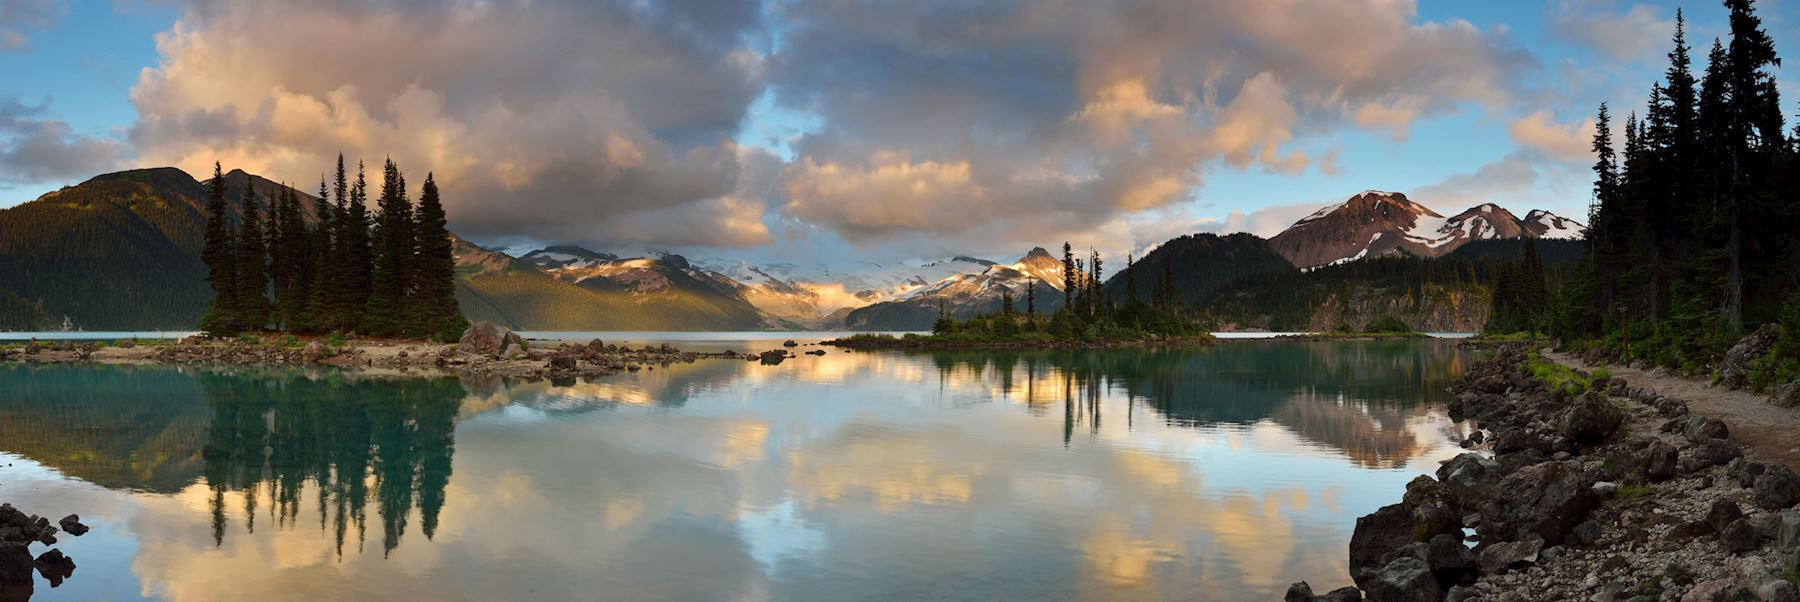 Visit Whistler, Canada